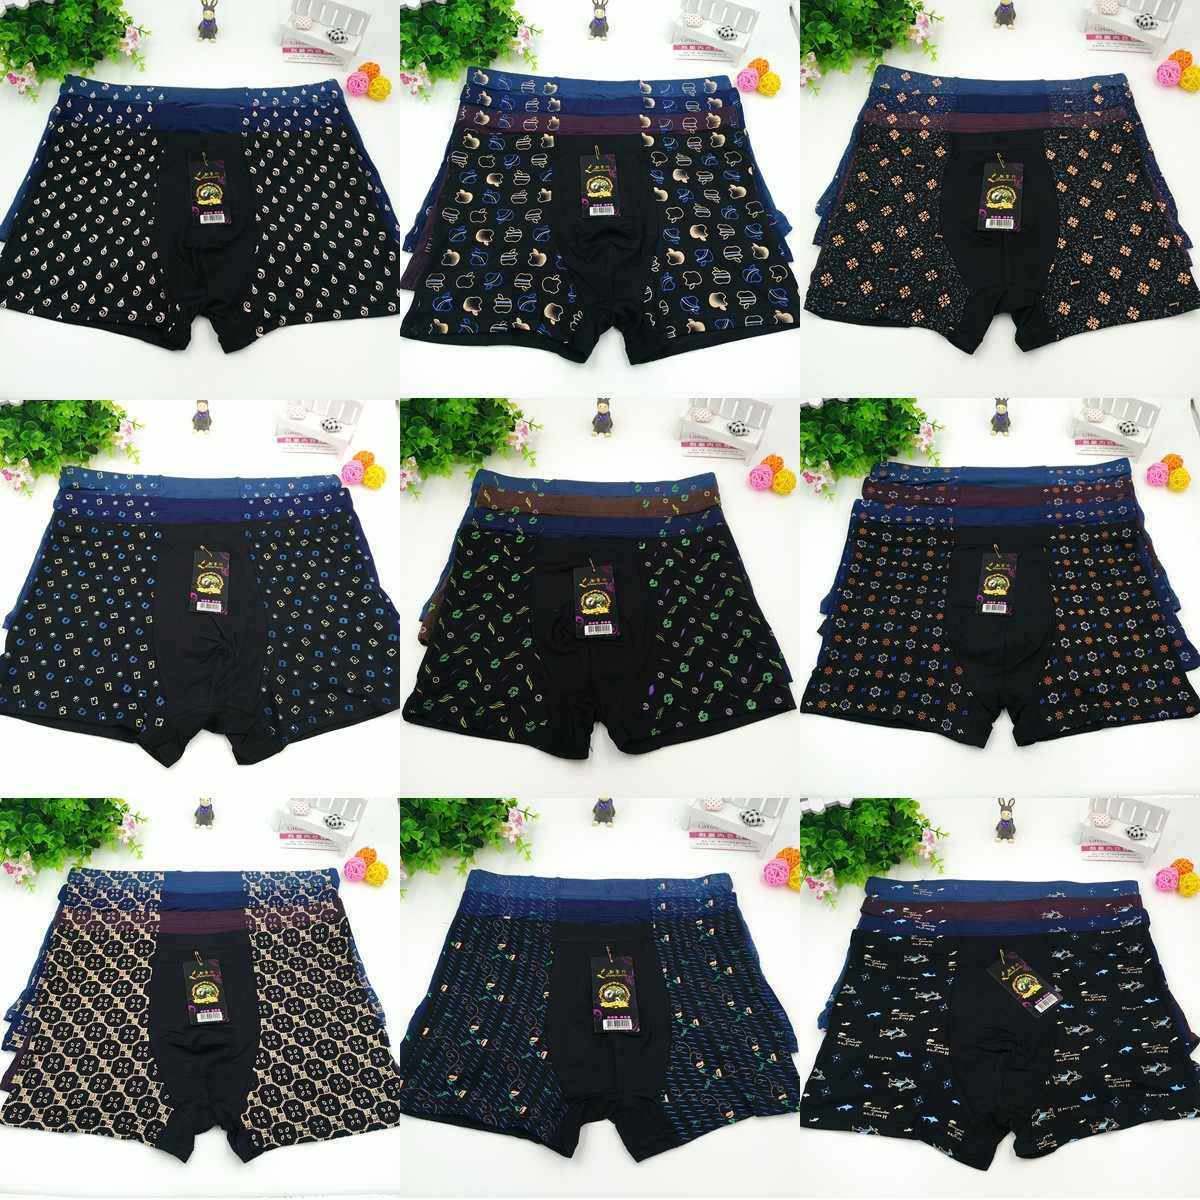 Boxer Mens underwear Man Polyester Underpants Male Print Men Panties Shorts Underwear Boxer Shorts 2XL to 7XL